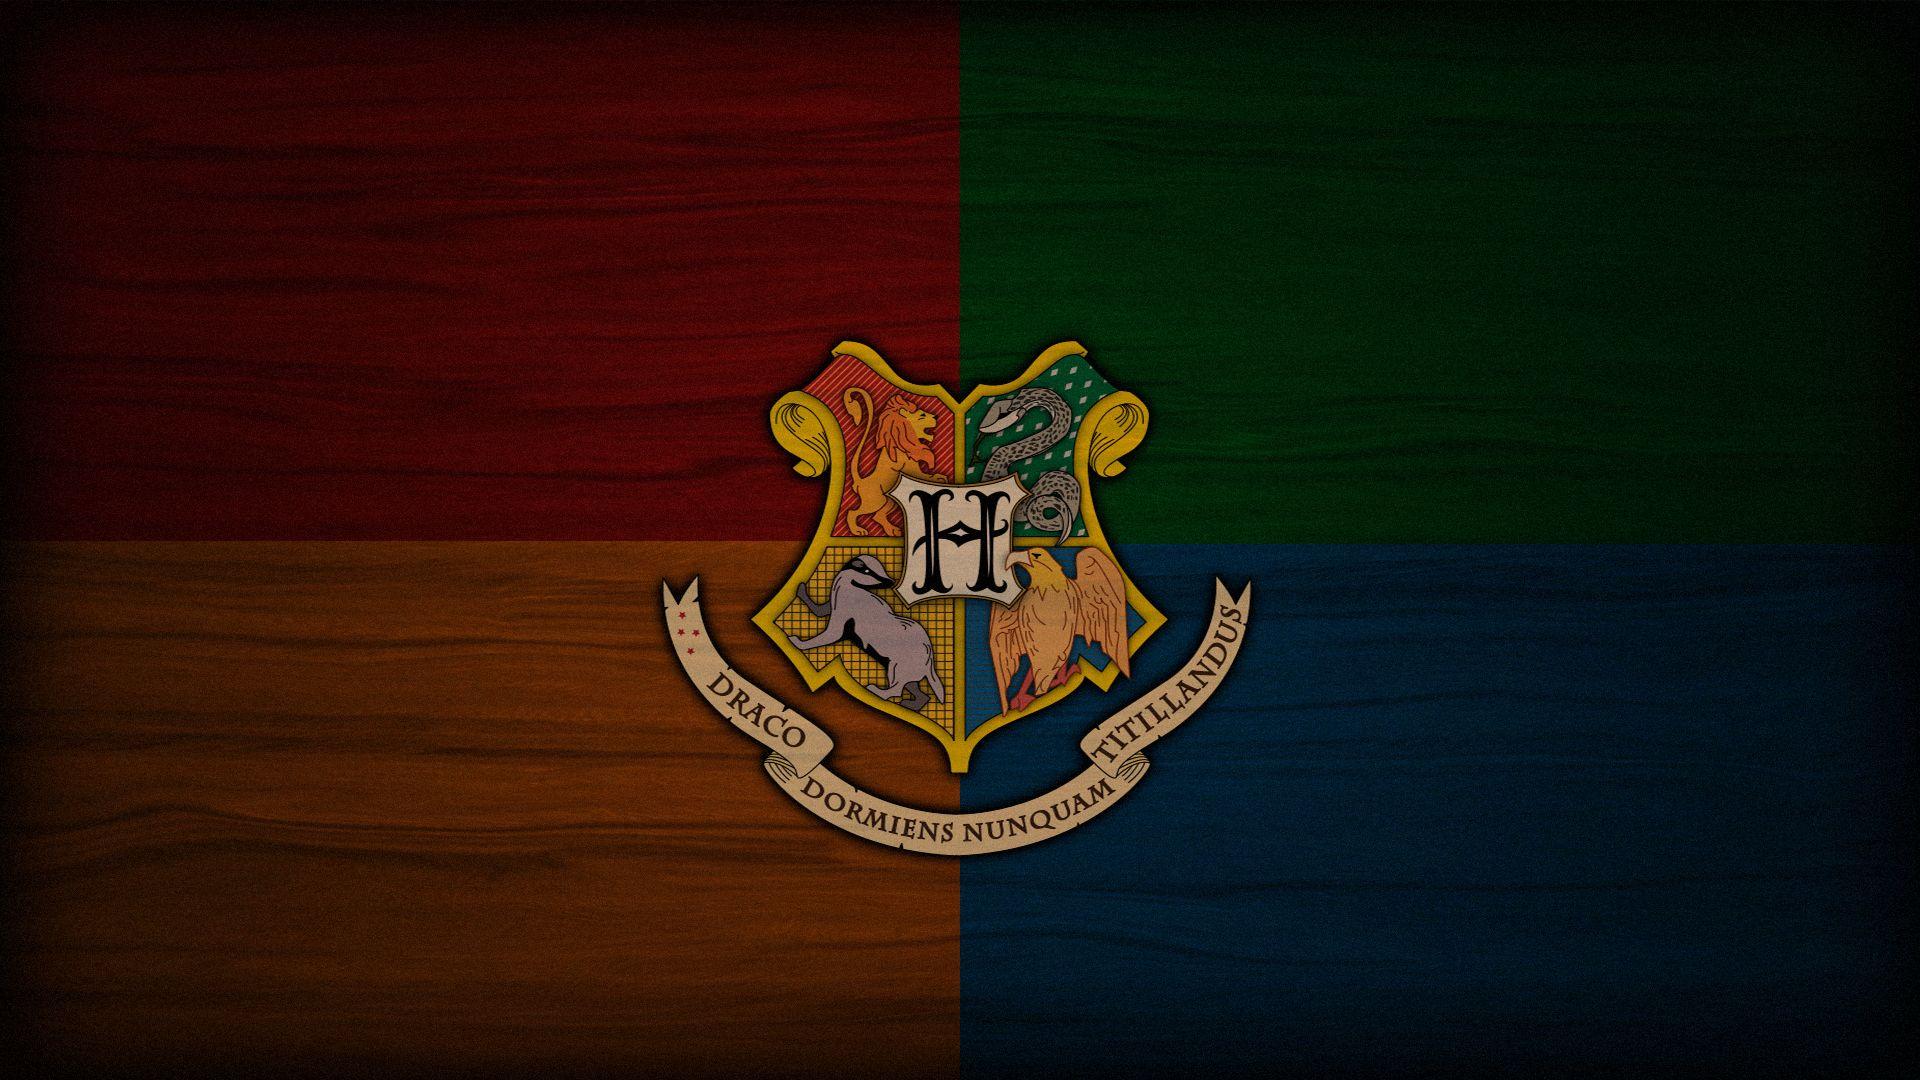 Harry Potter download nice wallpaper